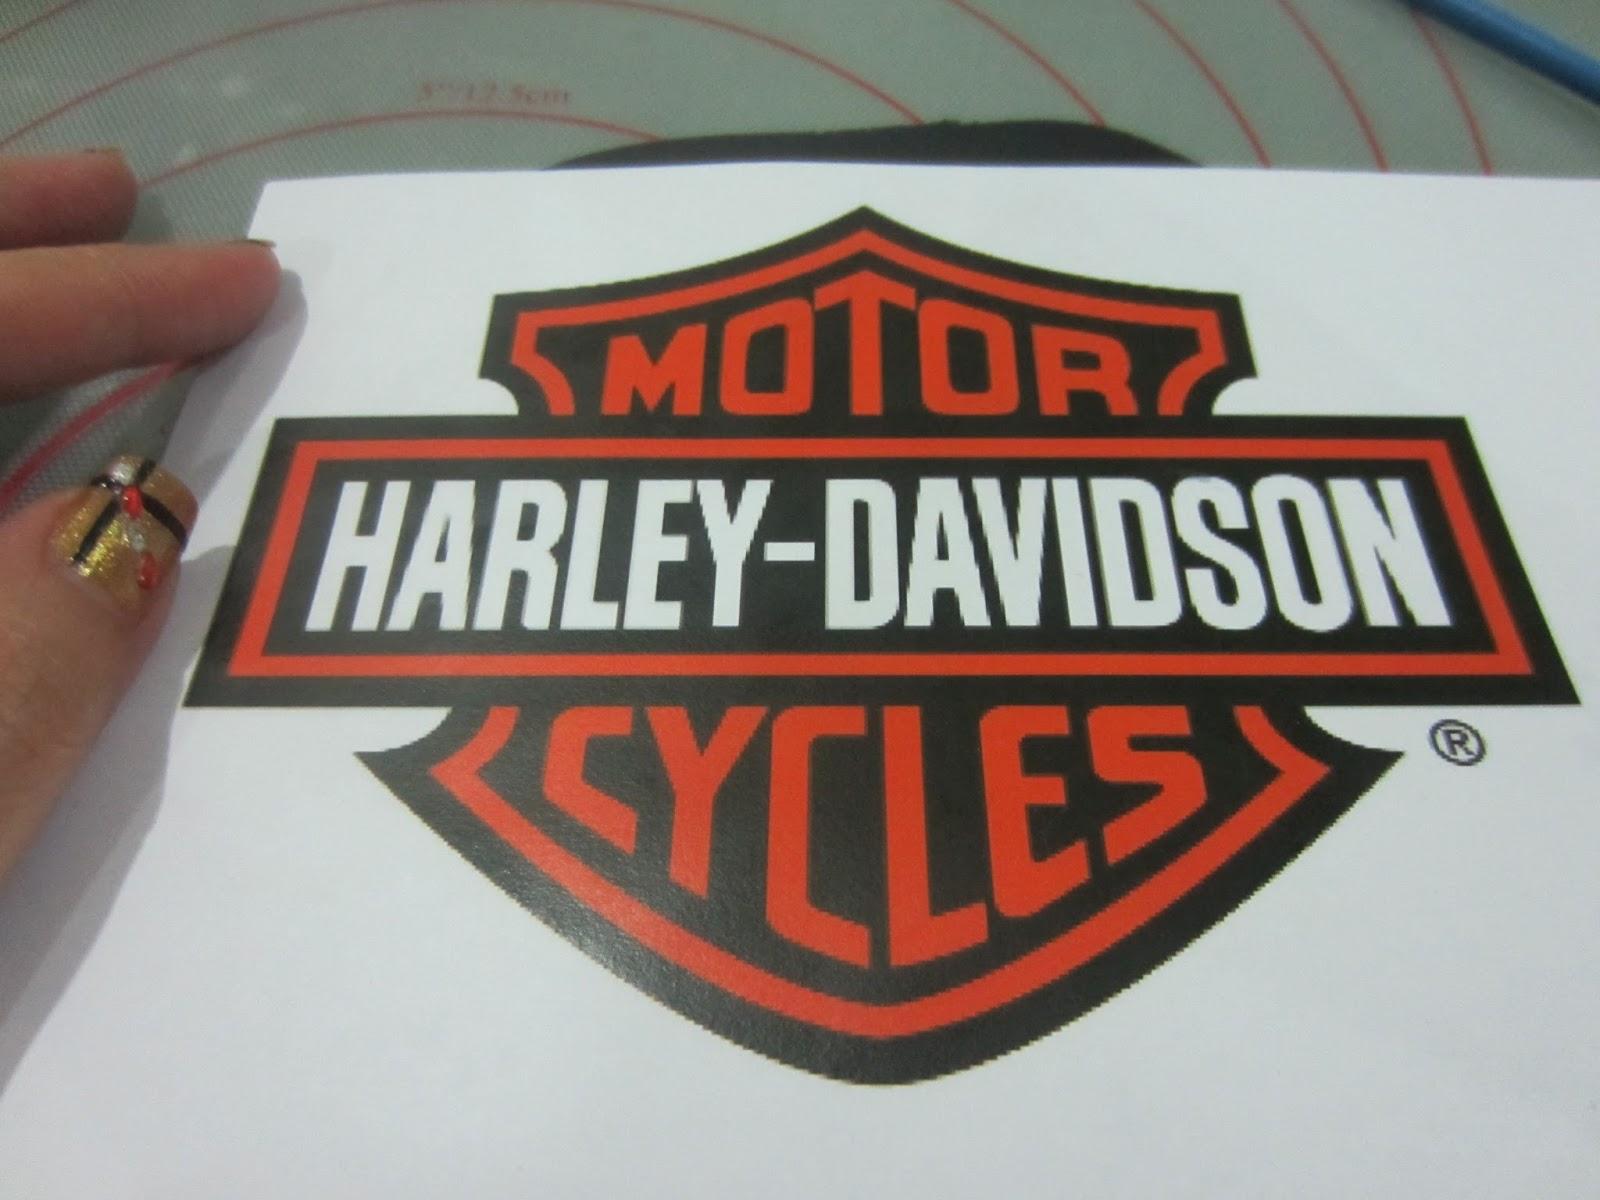 Harley Davidson Wedding Ring Sets 77 Ideal Next up the logo